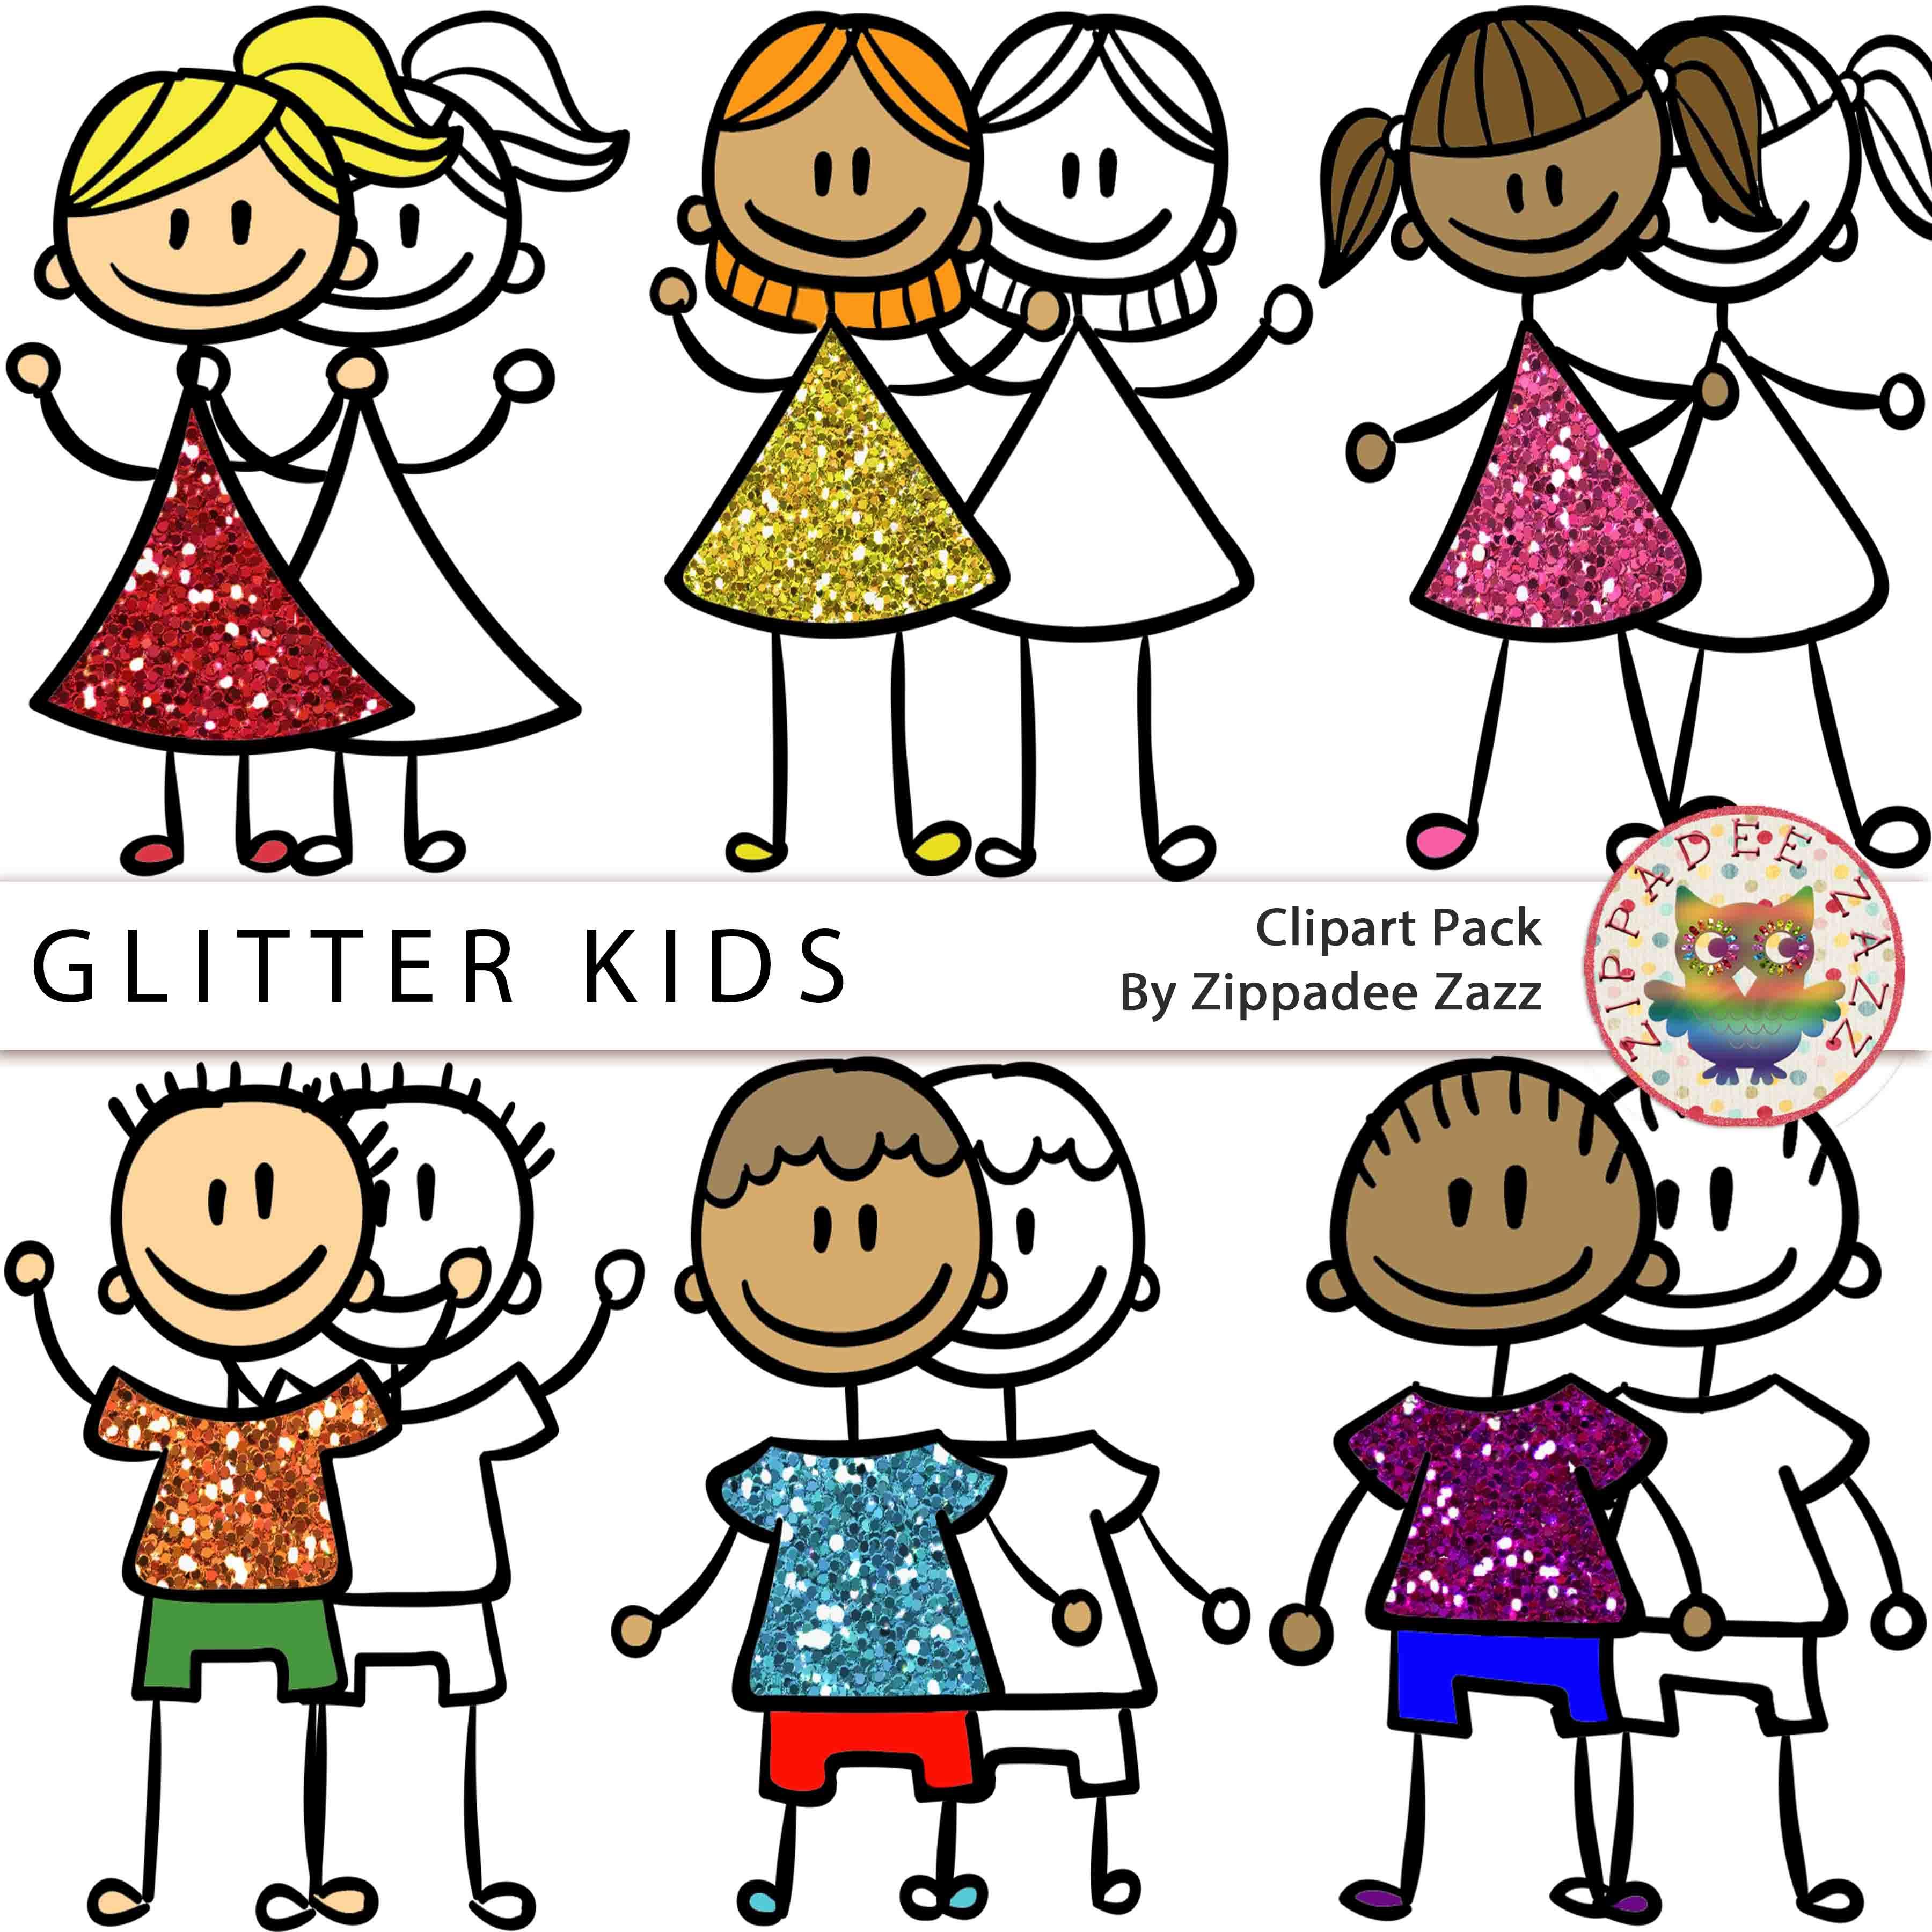 3600x3600 Glitter Kids Children Clipart Bw Line Art Included Free